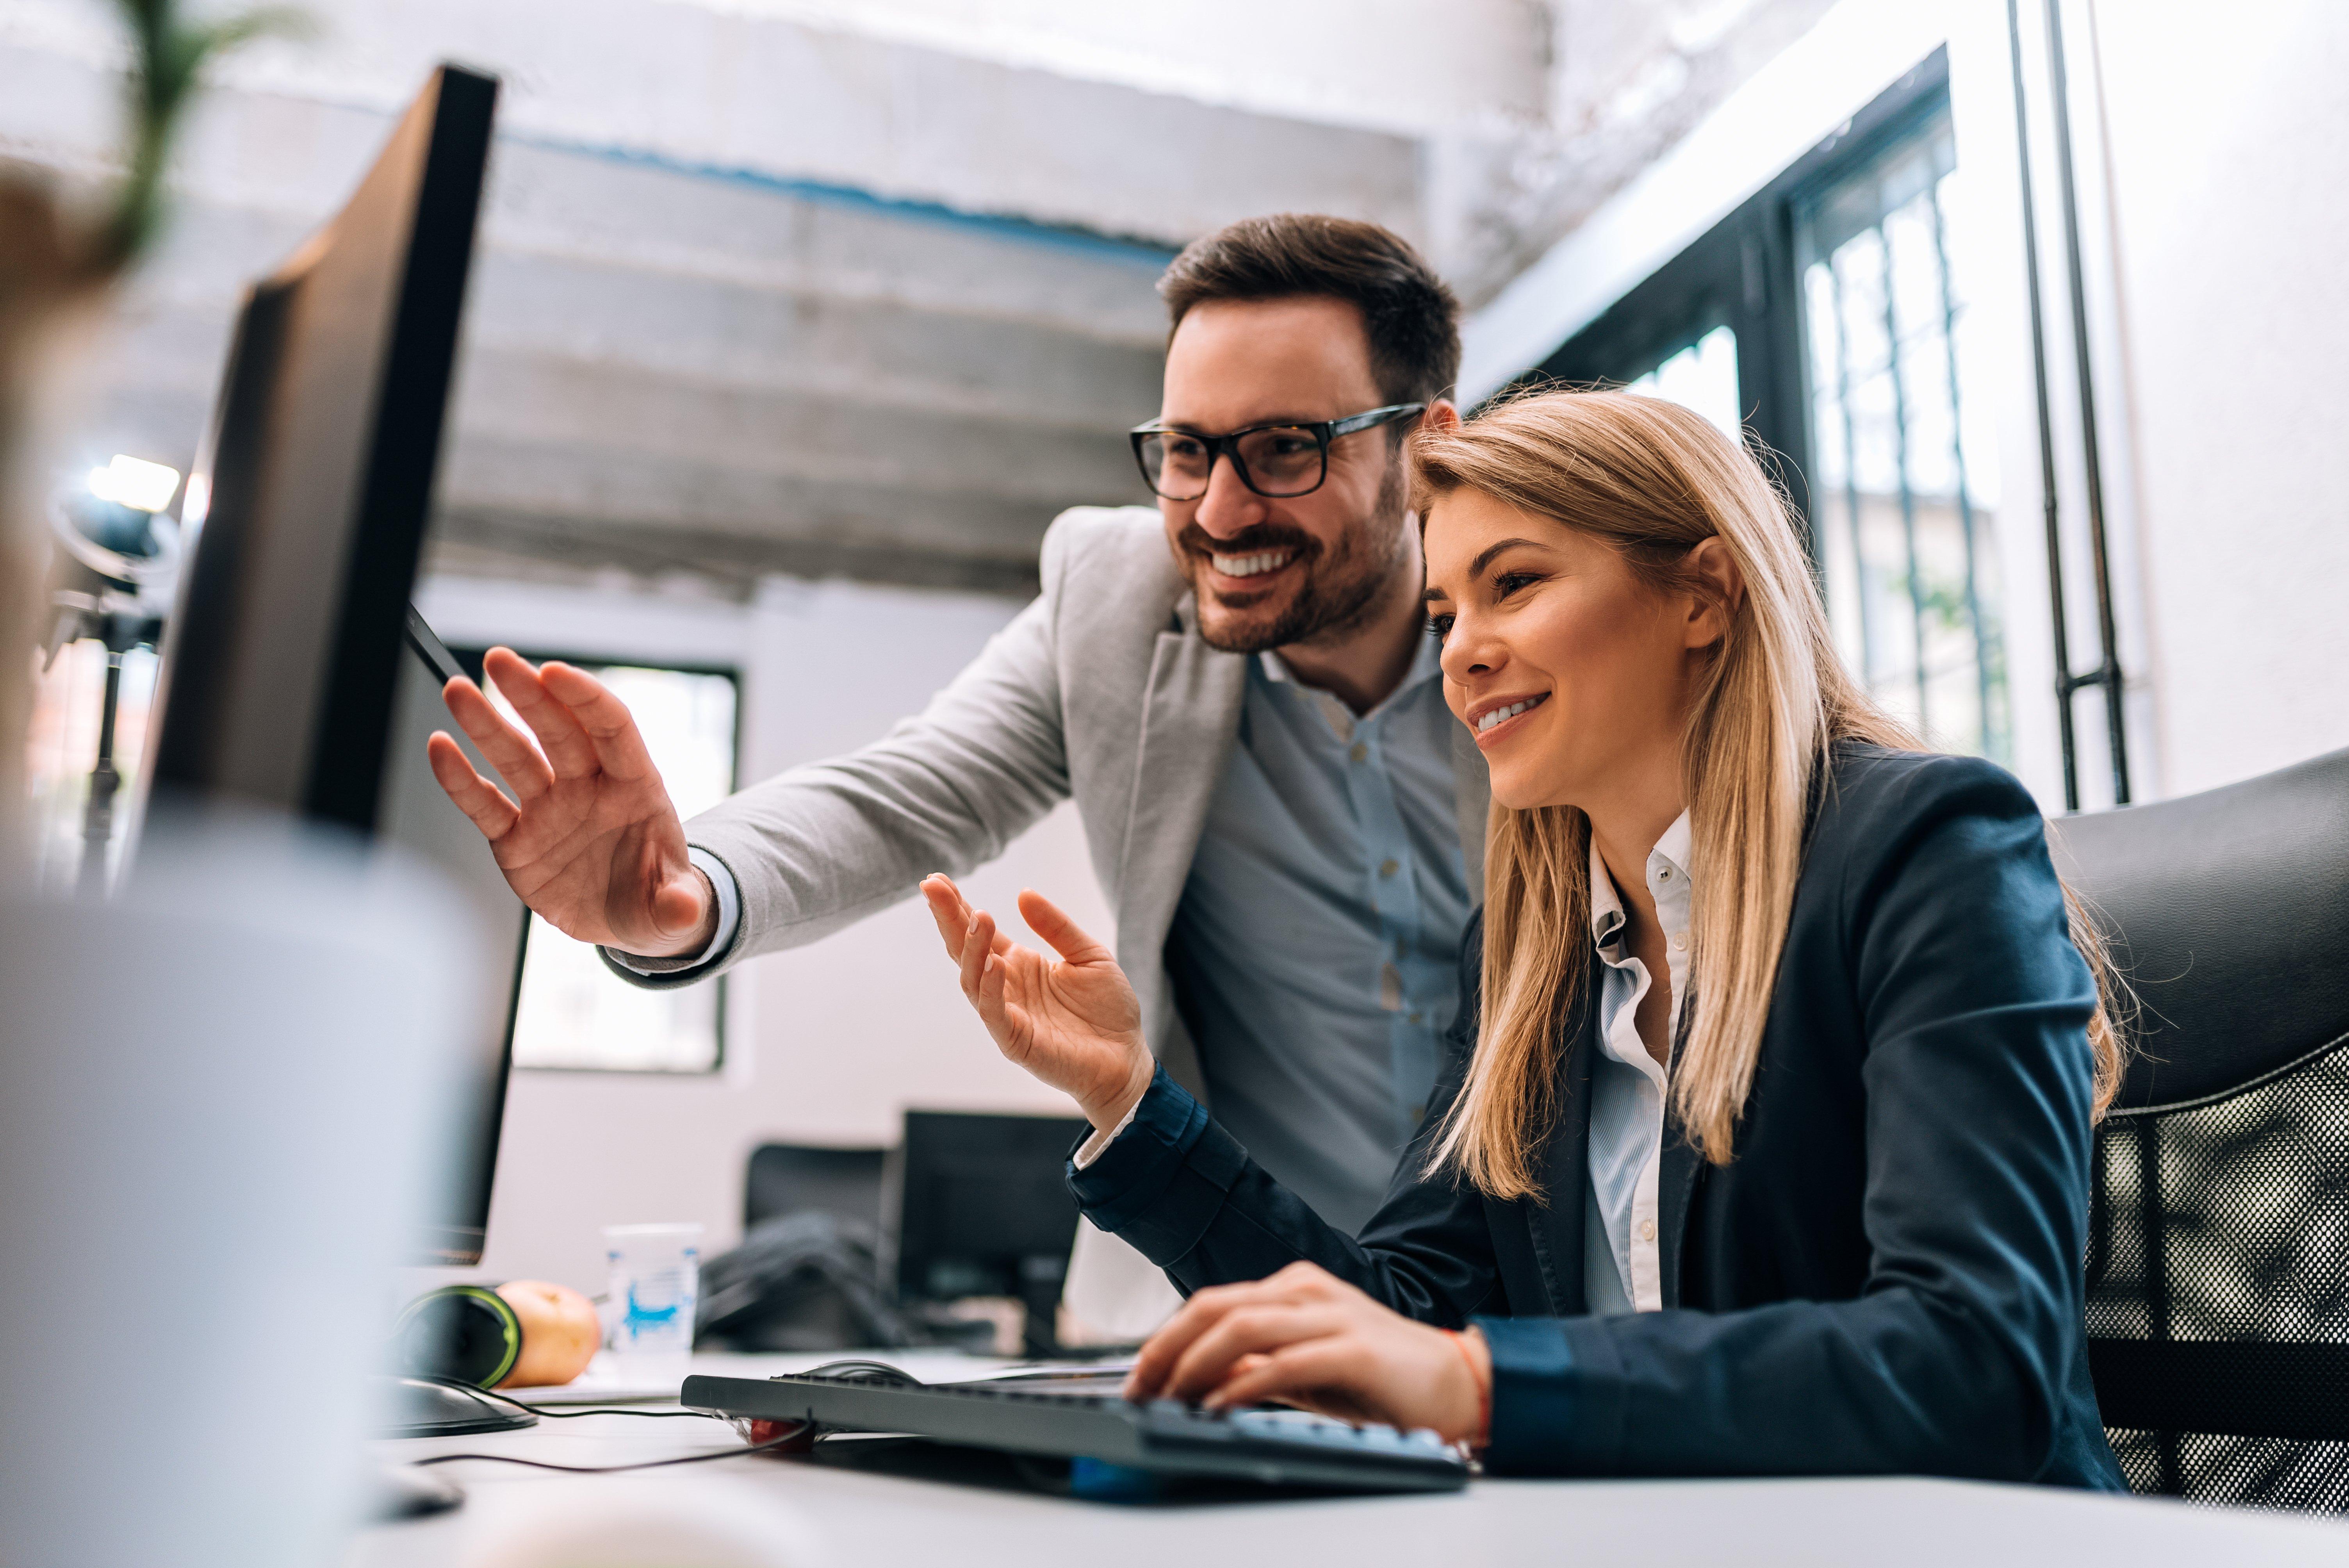 3 Types of Online Job Advertising: Job Postings, Job Slots & Sponsored Jobs